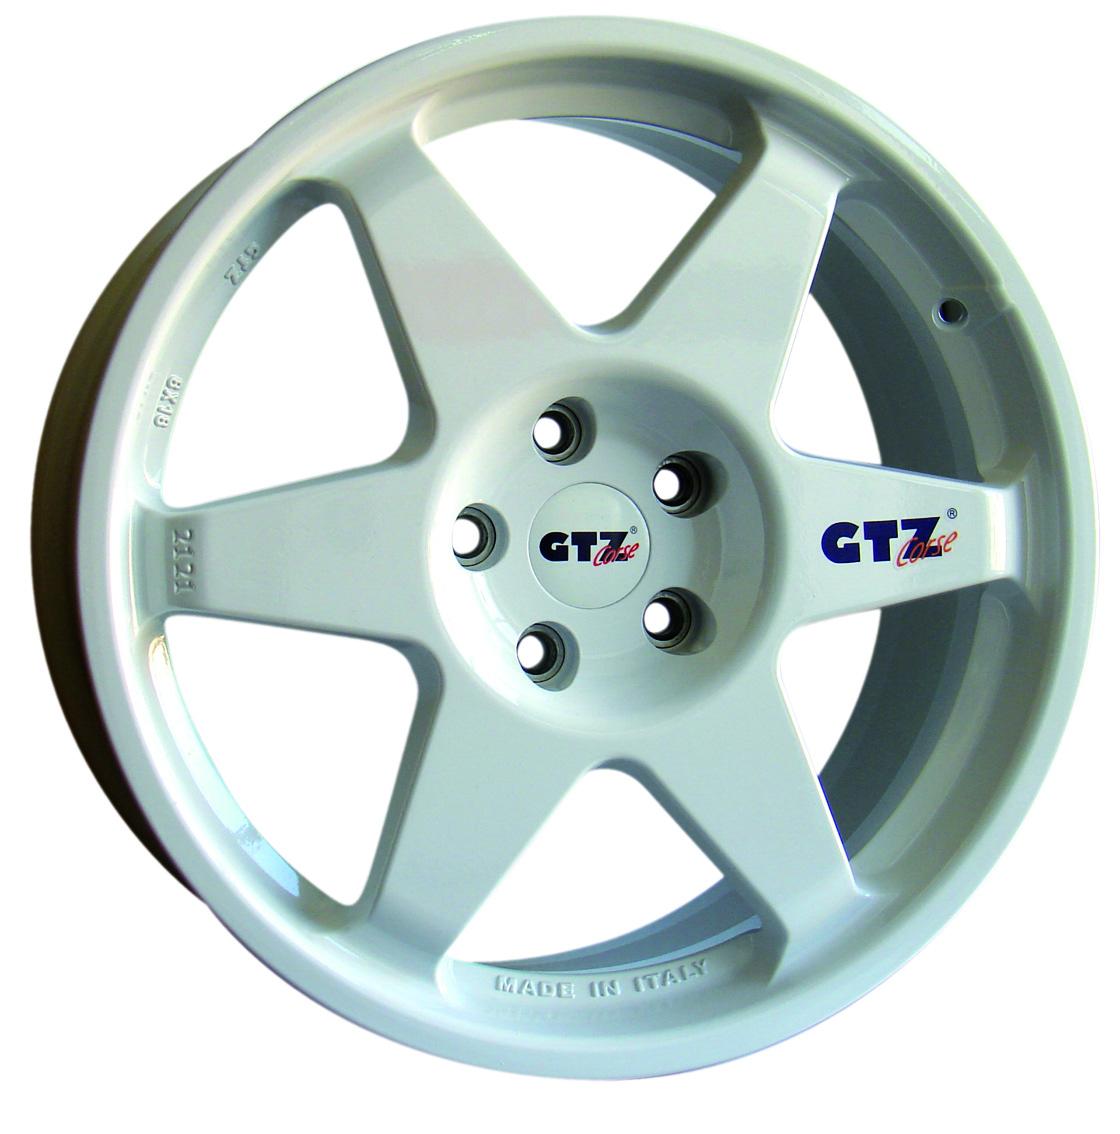 SPEEDLINE CORSE GTZ type 2121 8x18 5x114.3 ET35 WHITE